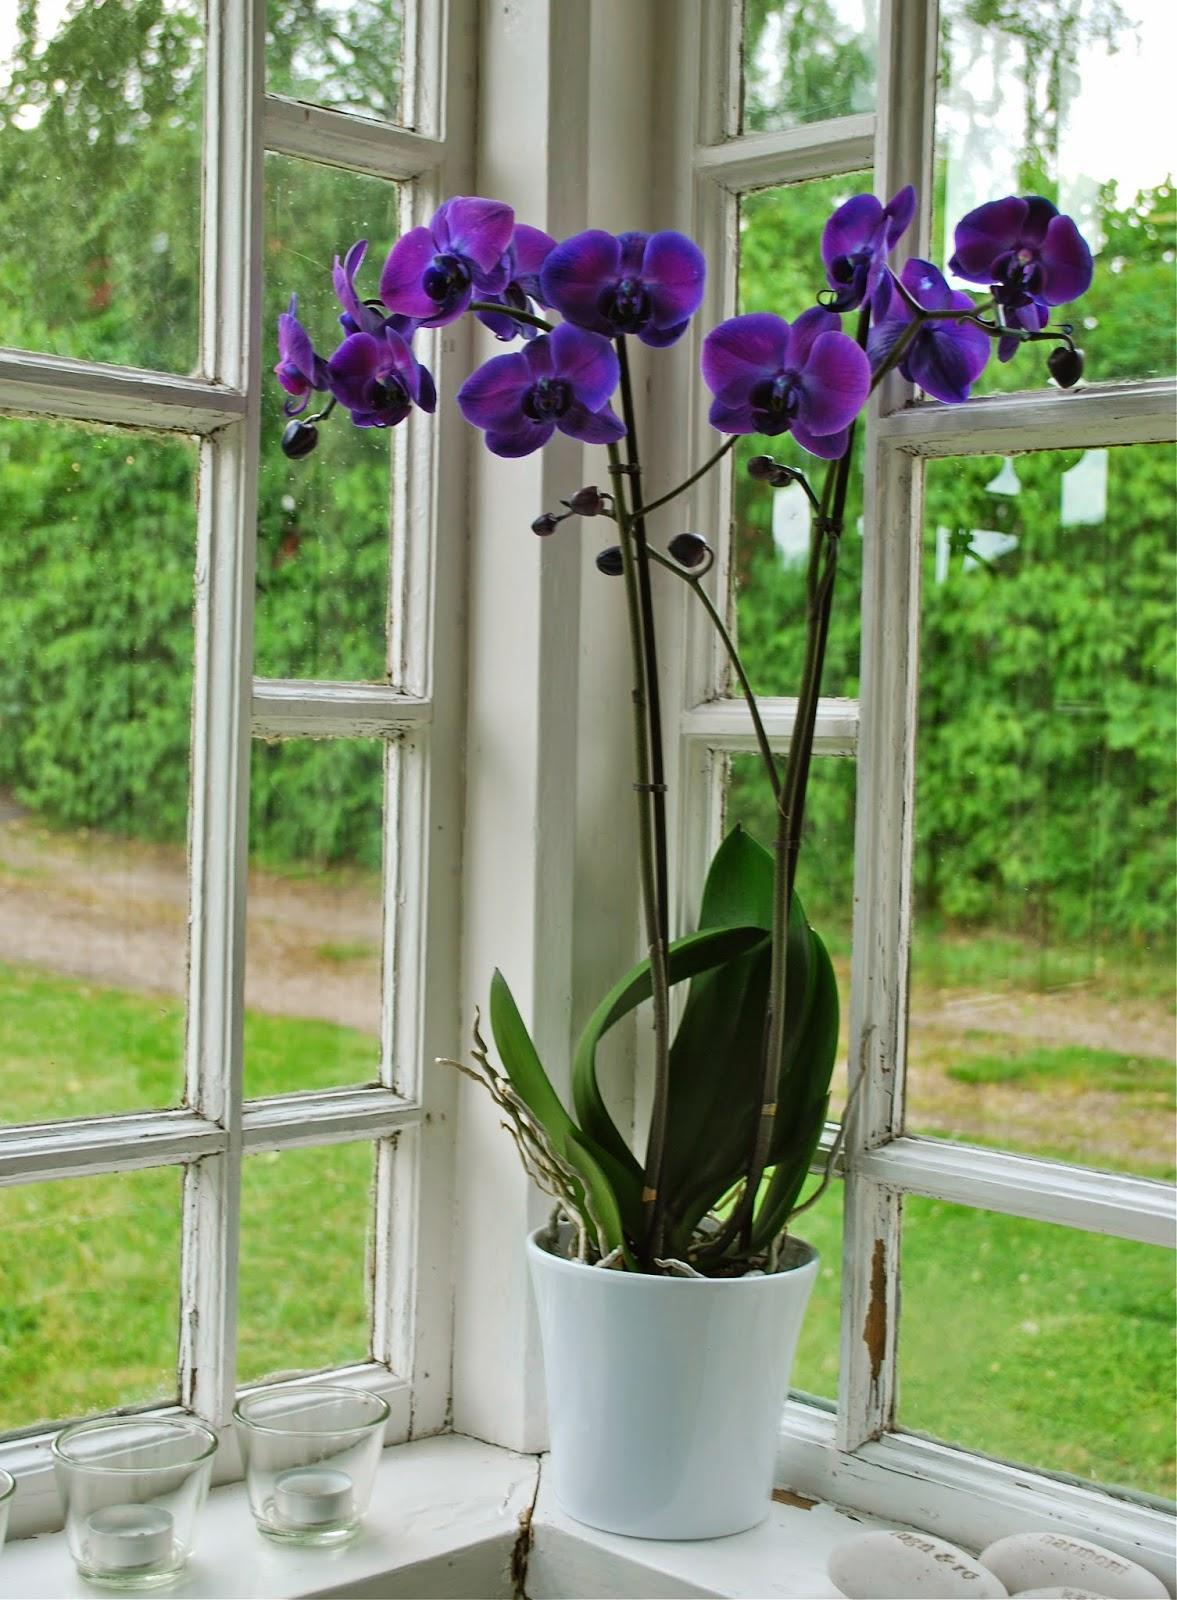 Fröken gröns blogg: lila orkidé